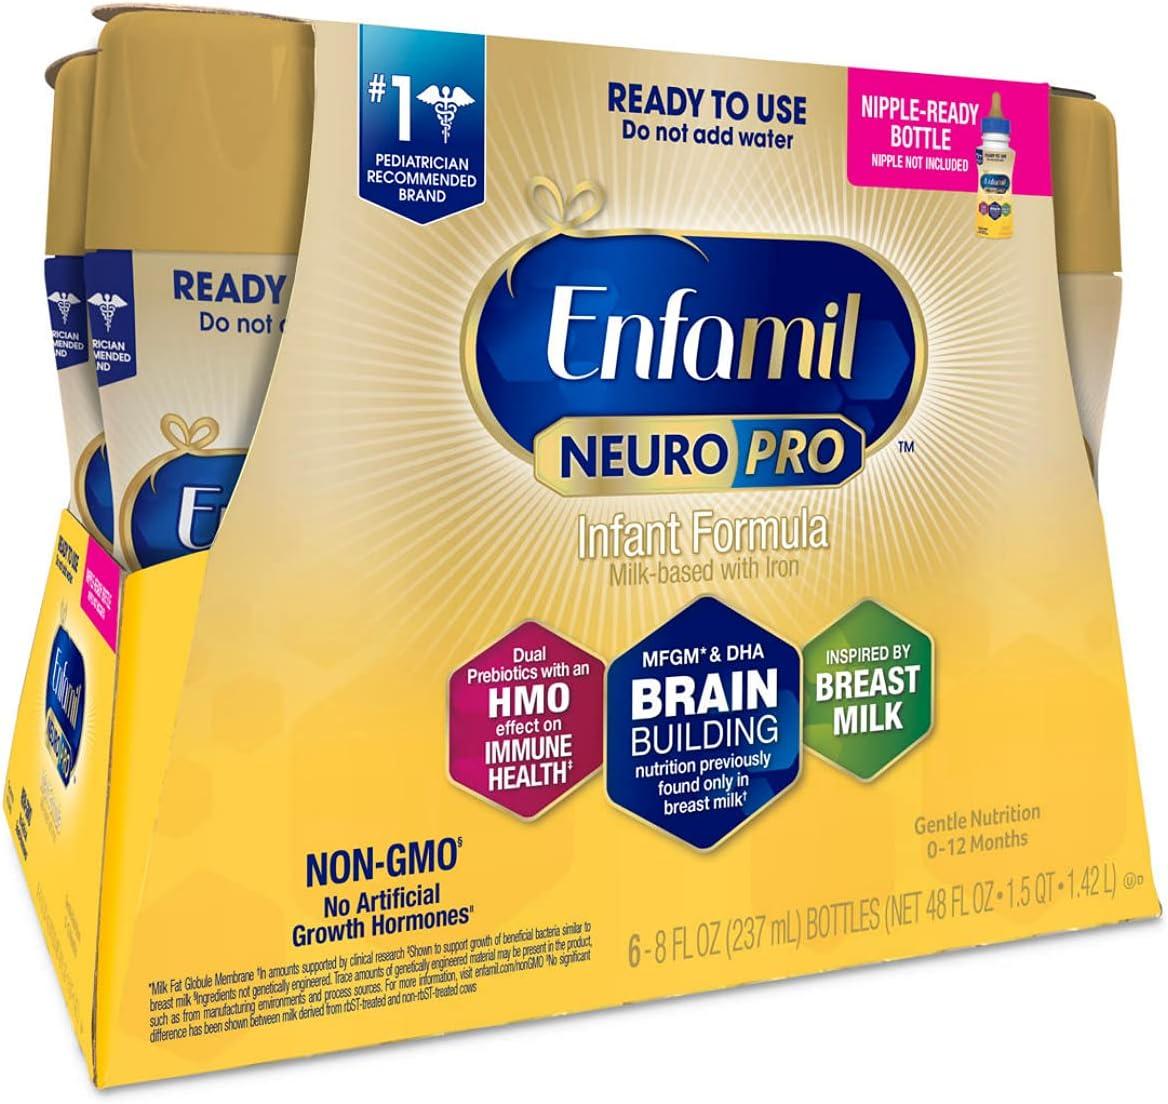 Enfamil NeuroPro Ready-to-Use Baby Formula Max 48% OFF to 2021 new Feed Brain Ready